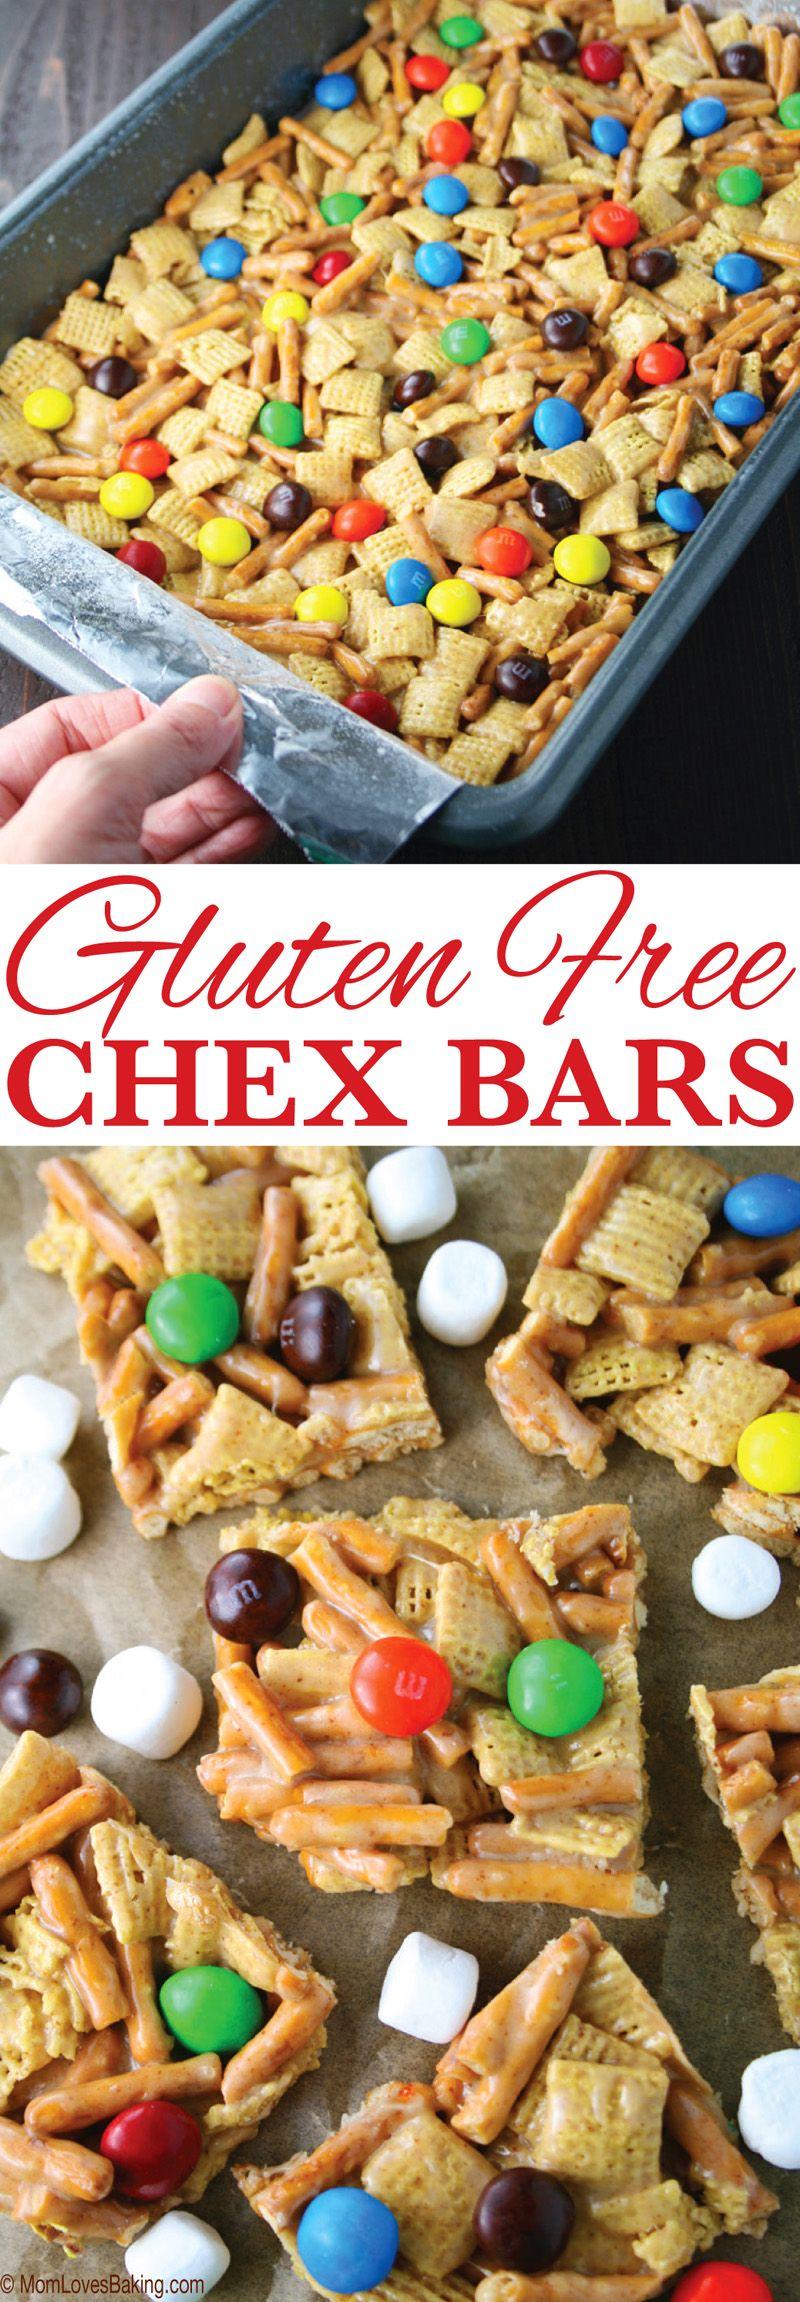 Gluten Free Chex Bars Recipe Gluten Free Treats Gluten Free